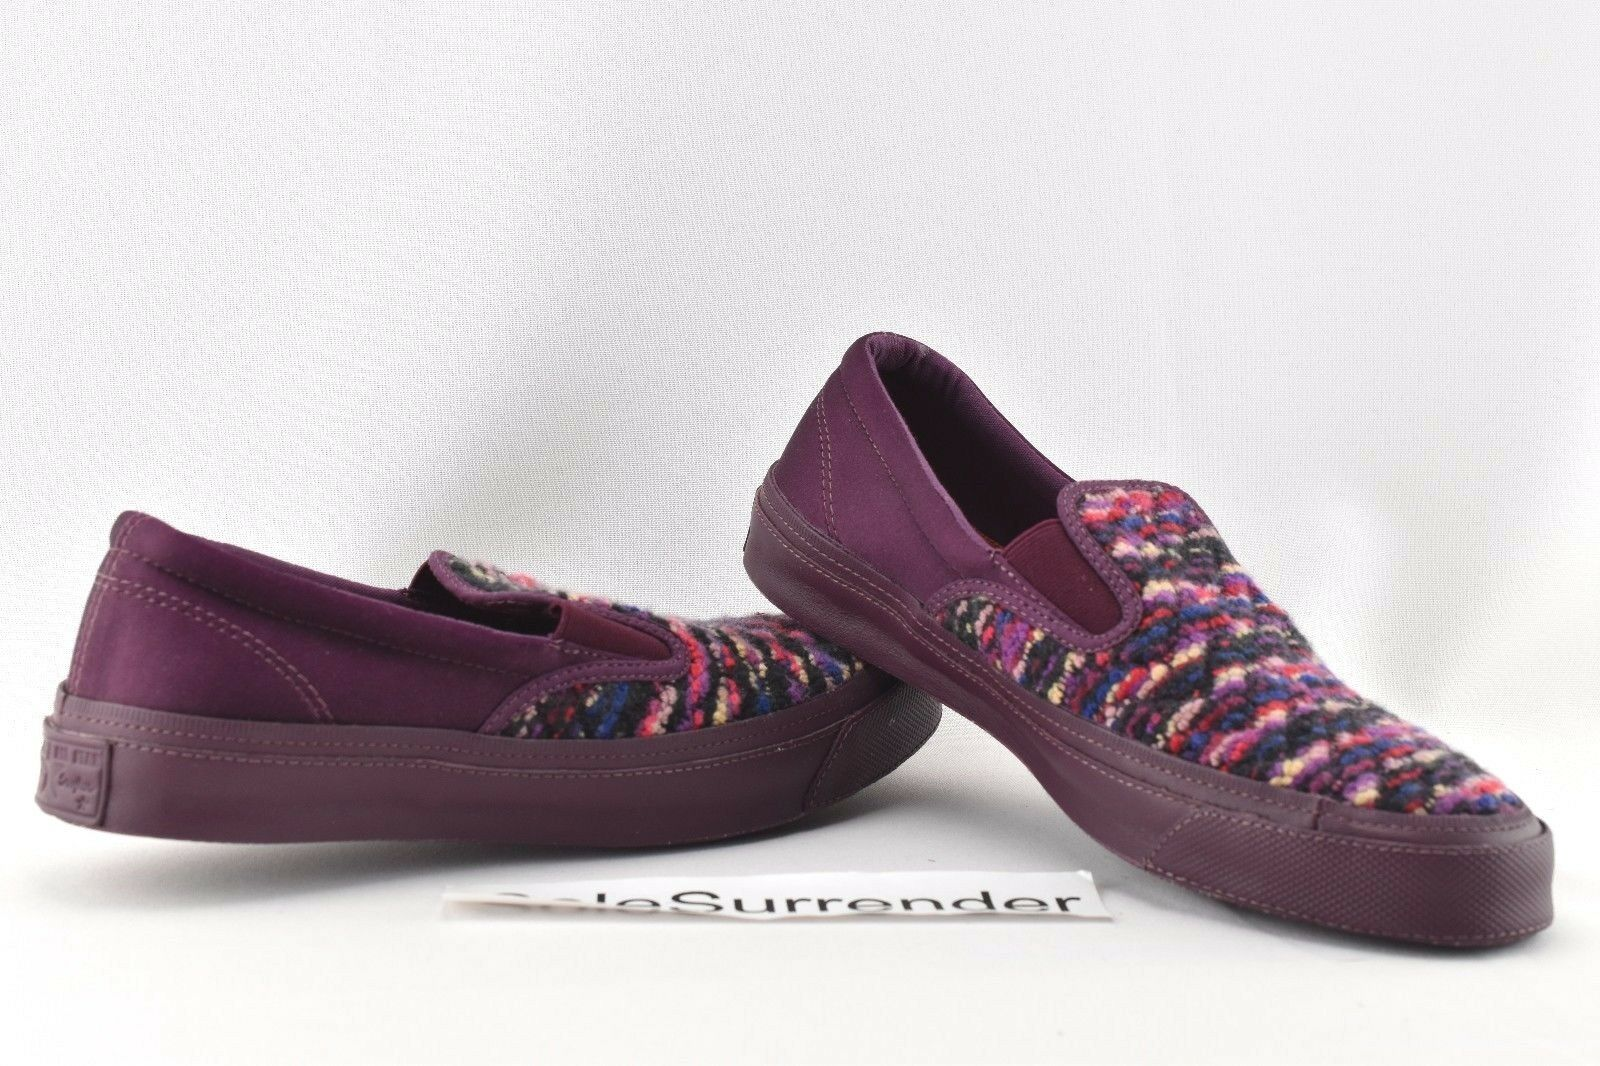 Converse X Missoni All Star Deckstar - CHOOSE SIZE- 151012C Burgundy Maroon Knit